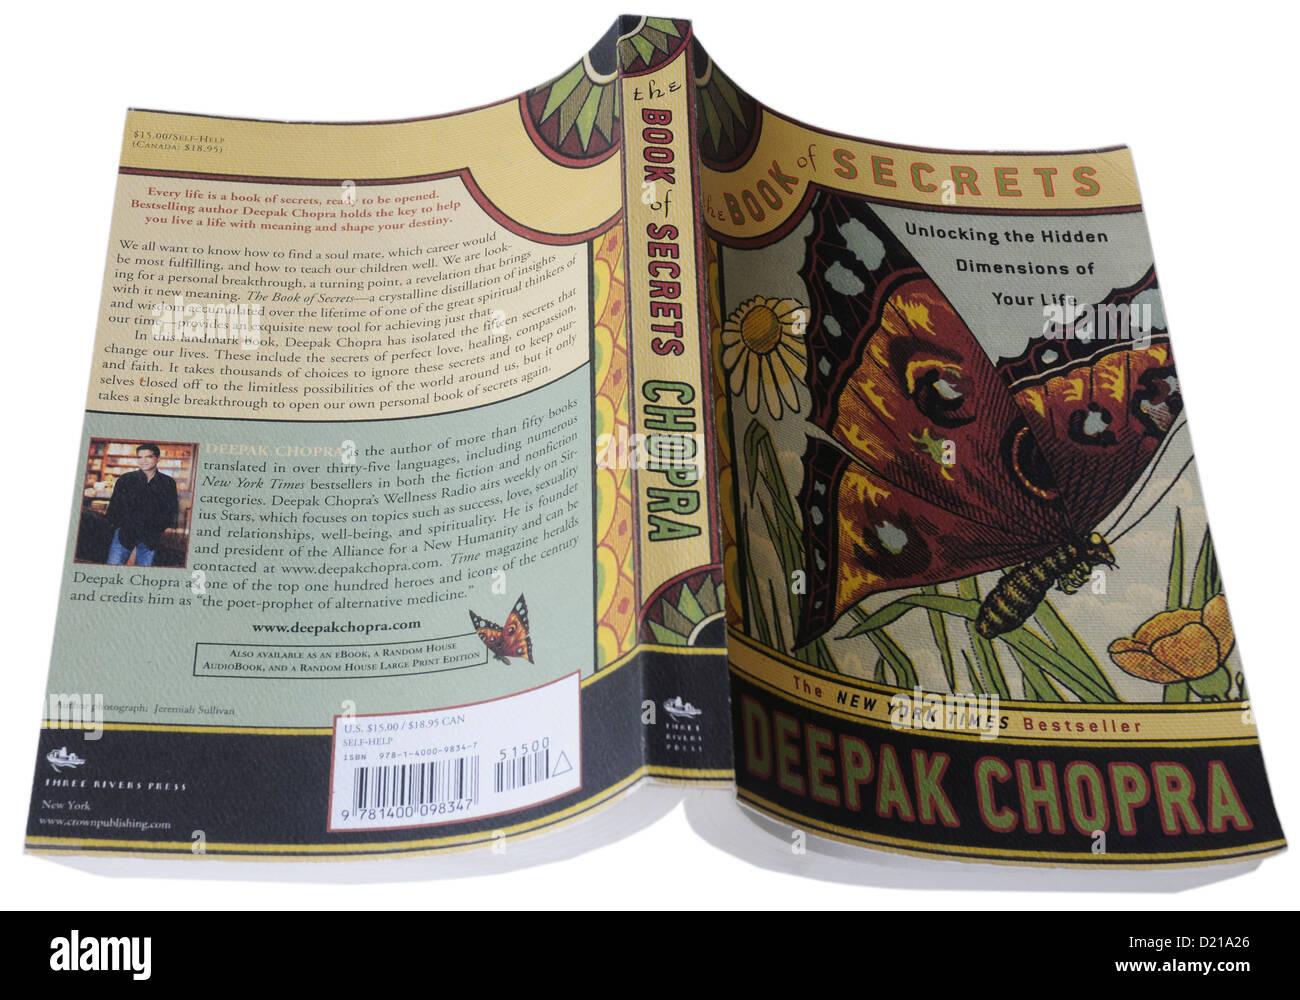 The Book of Secrets by Deepak Chopra - Stock Image